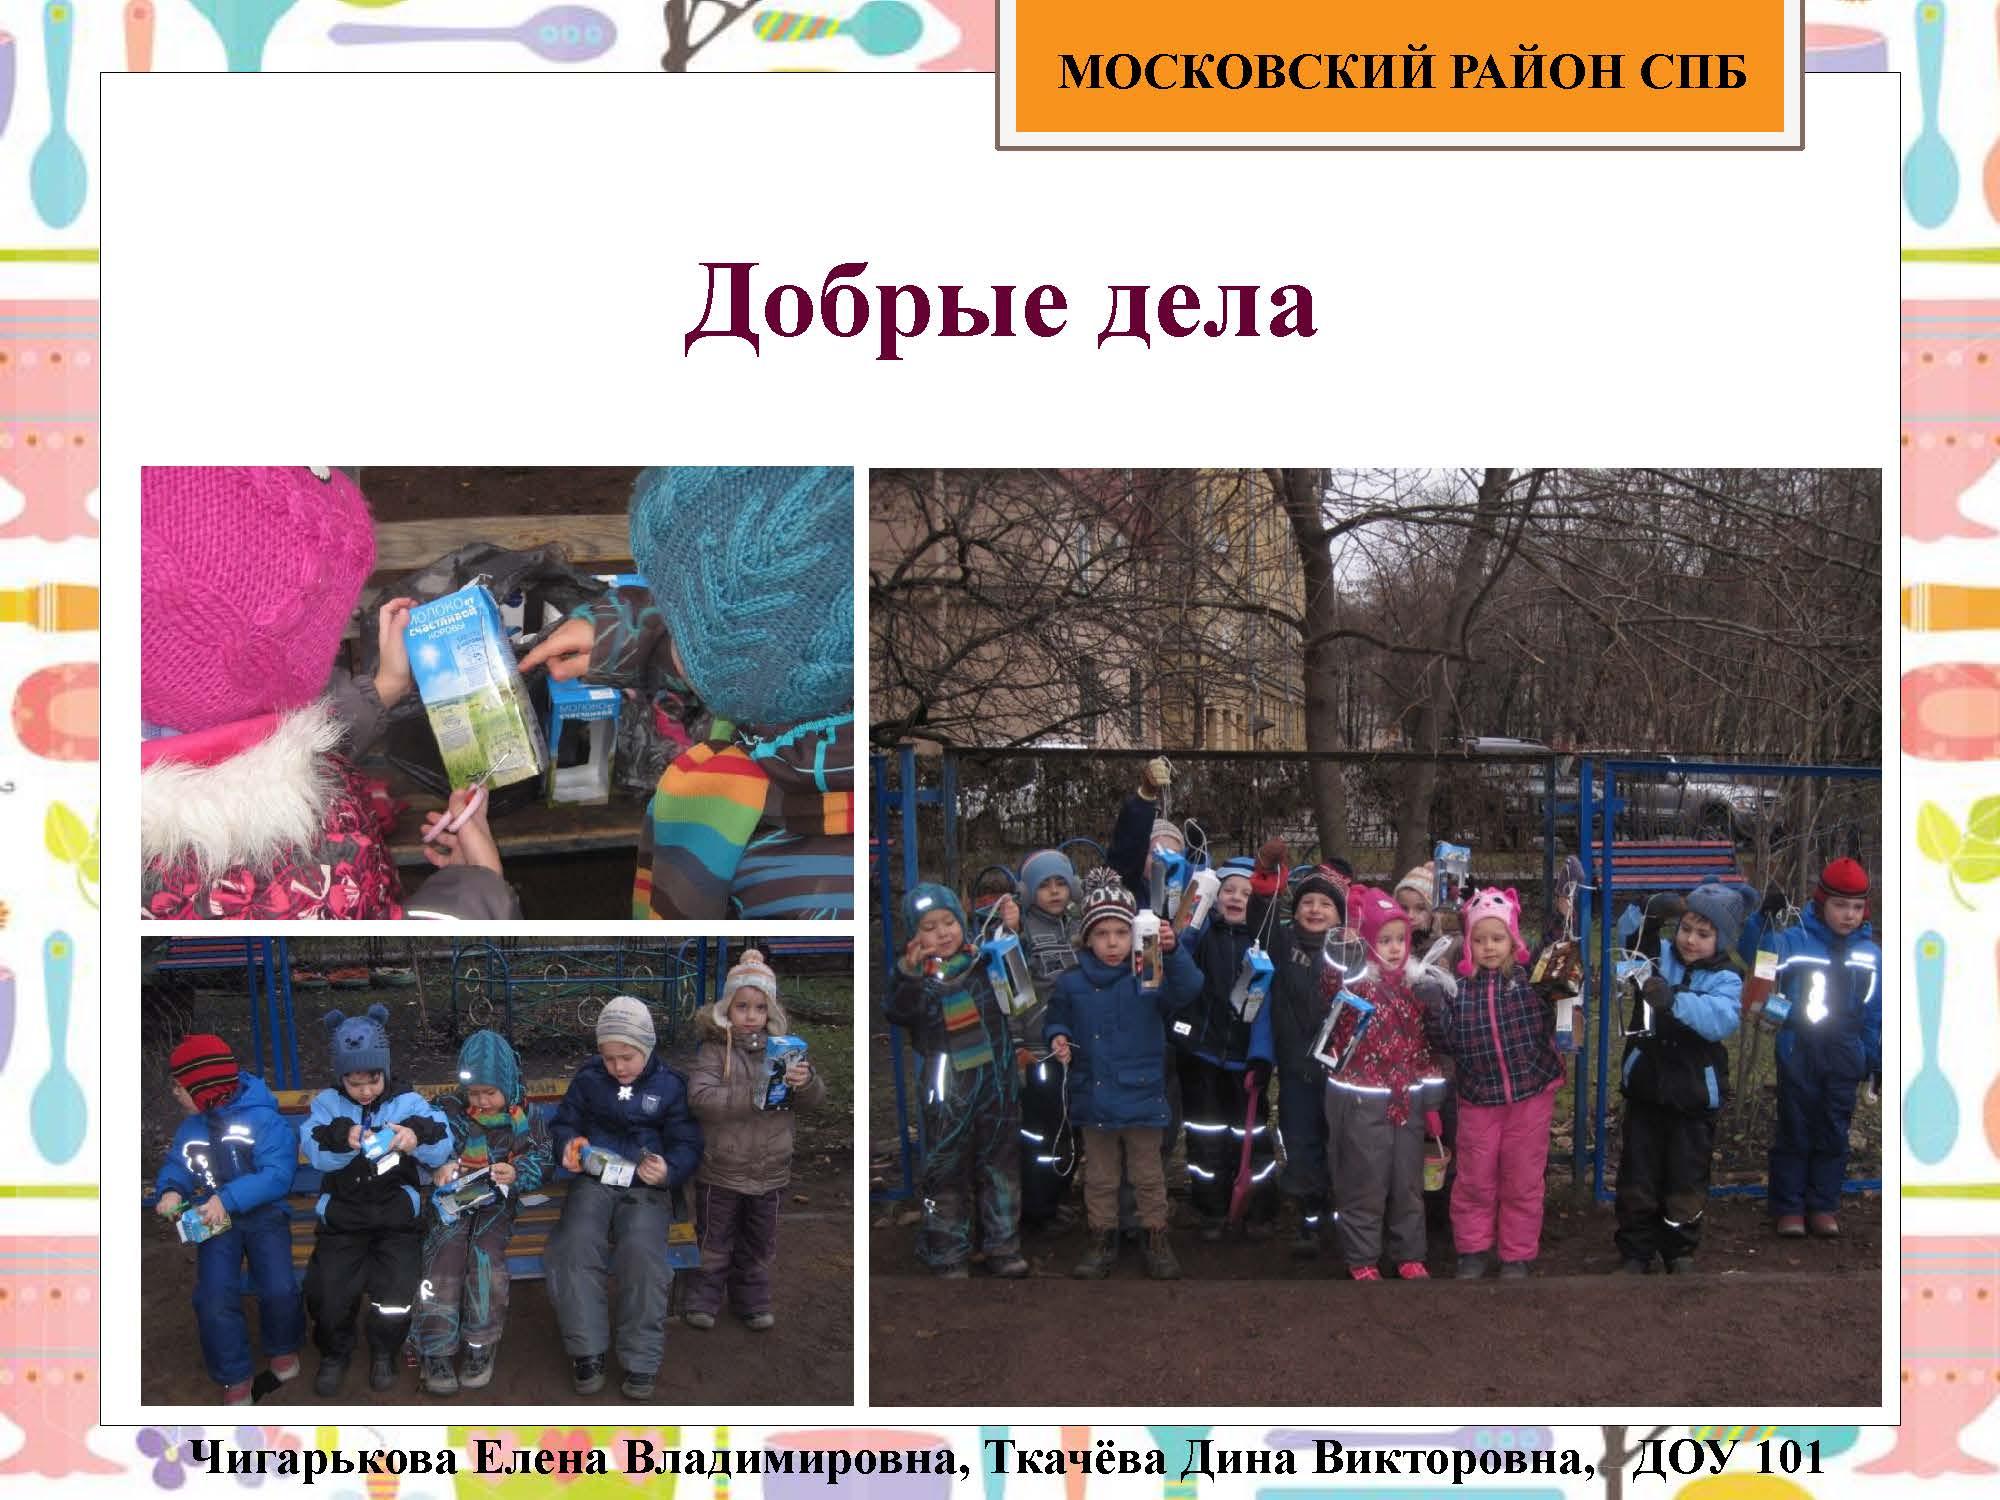 Секция 8. ДОУ 101, ПСИ. Московский район_Страница_09